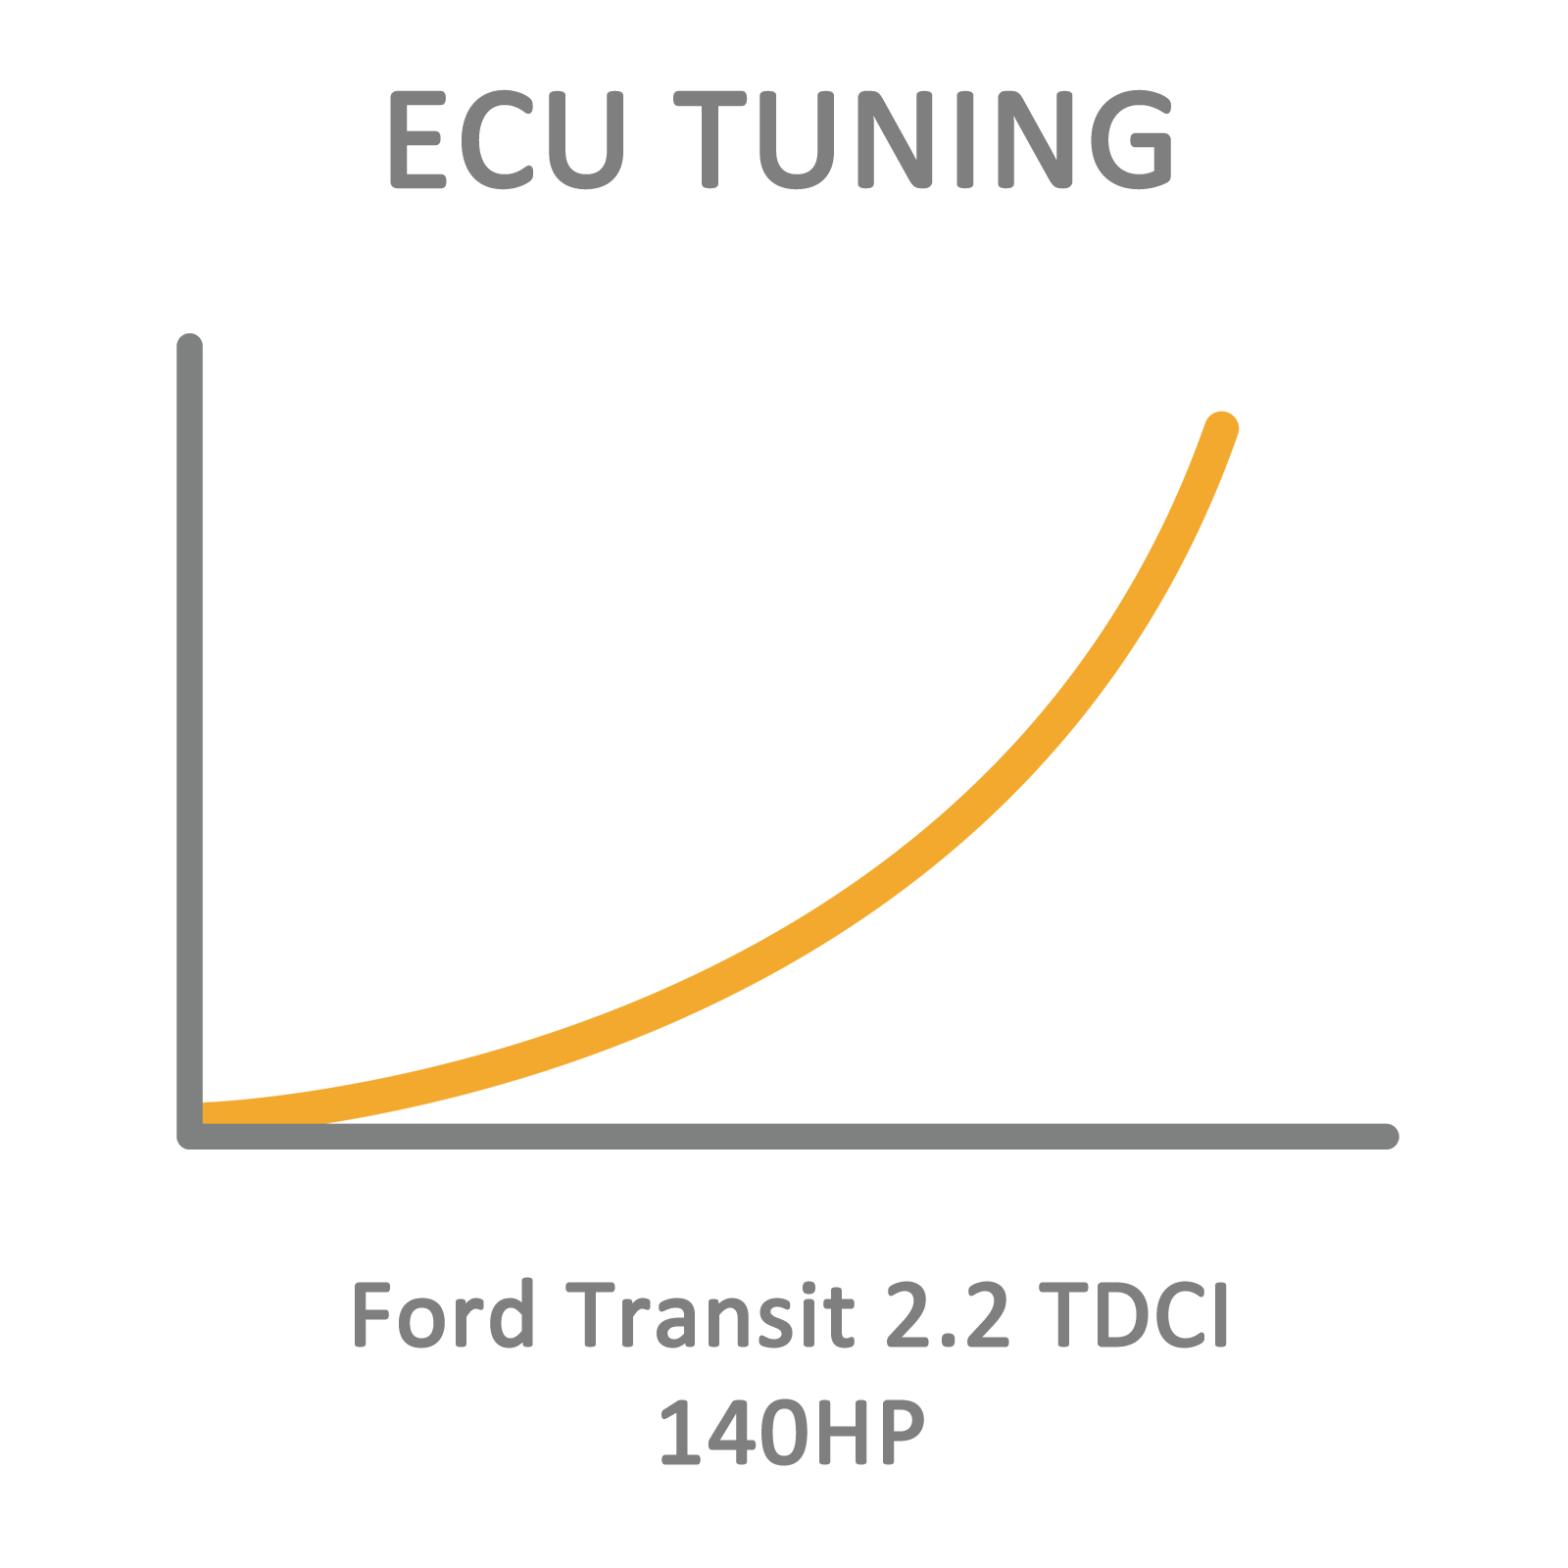 Ford Transit 2.2 TDCI 140HP ECU Tuning Remapping Programming